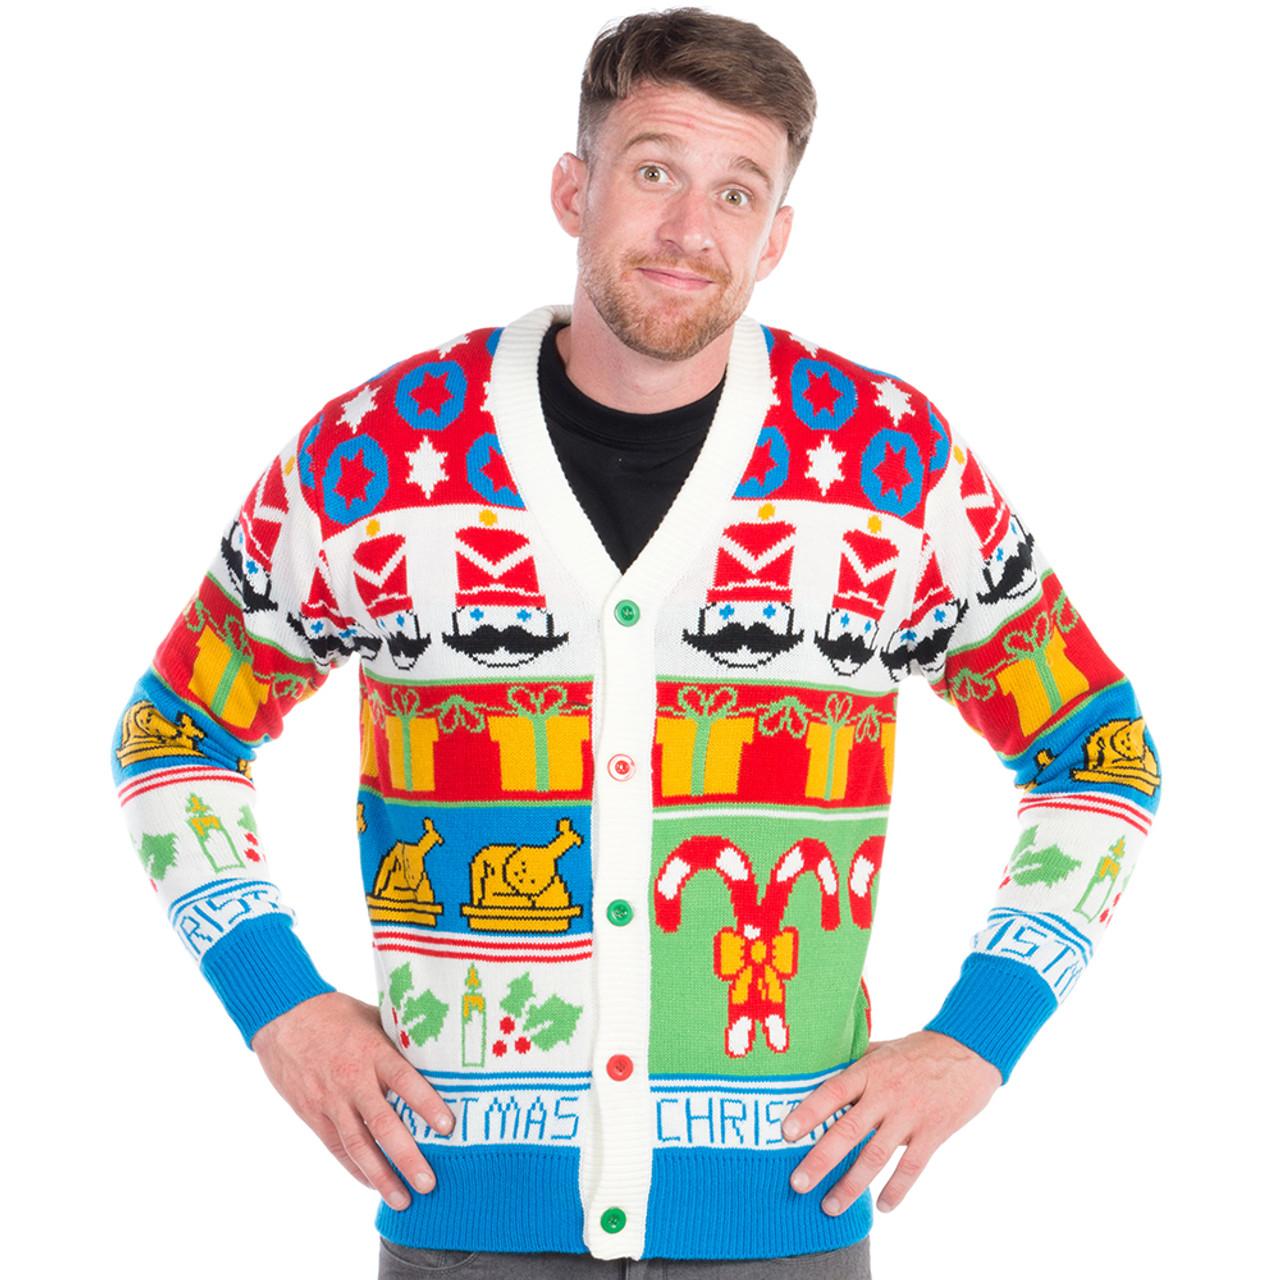 Christmas Cardigan Sweaters.Cheesy Nutcracker Ugly Christmas Cardigan World S Best